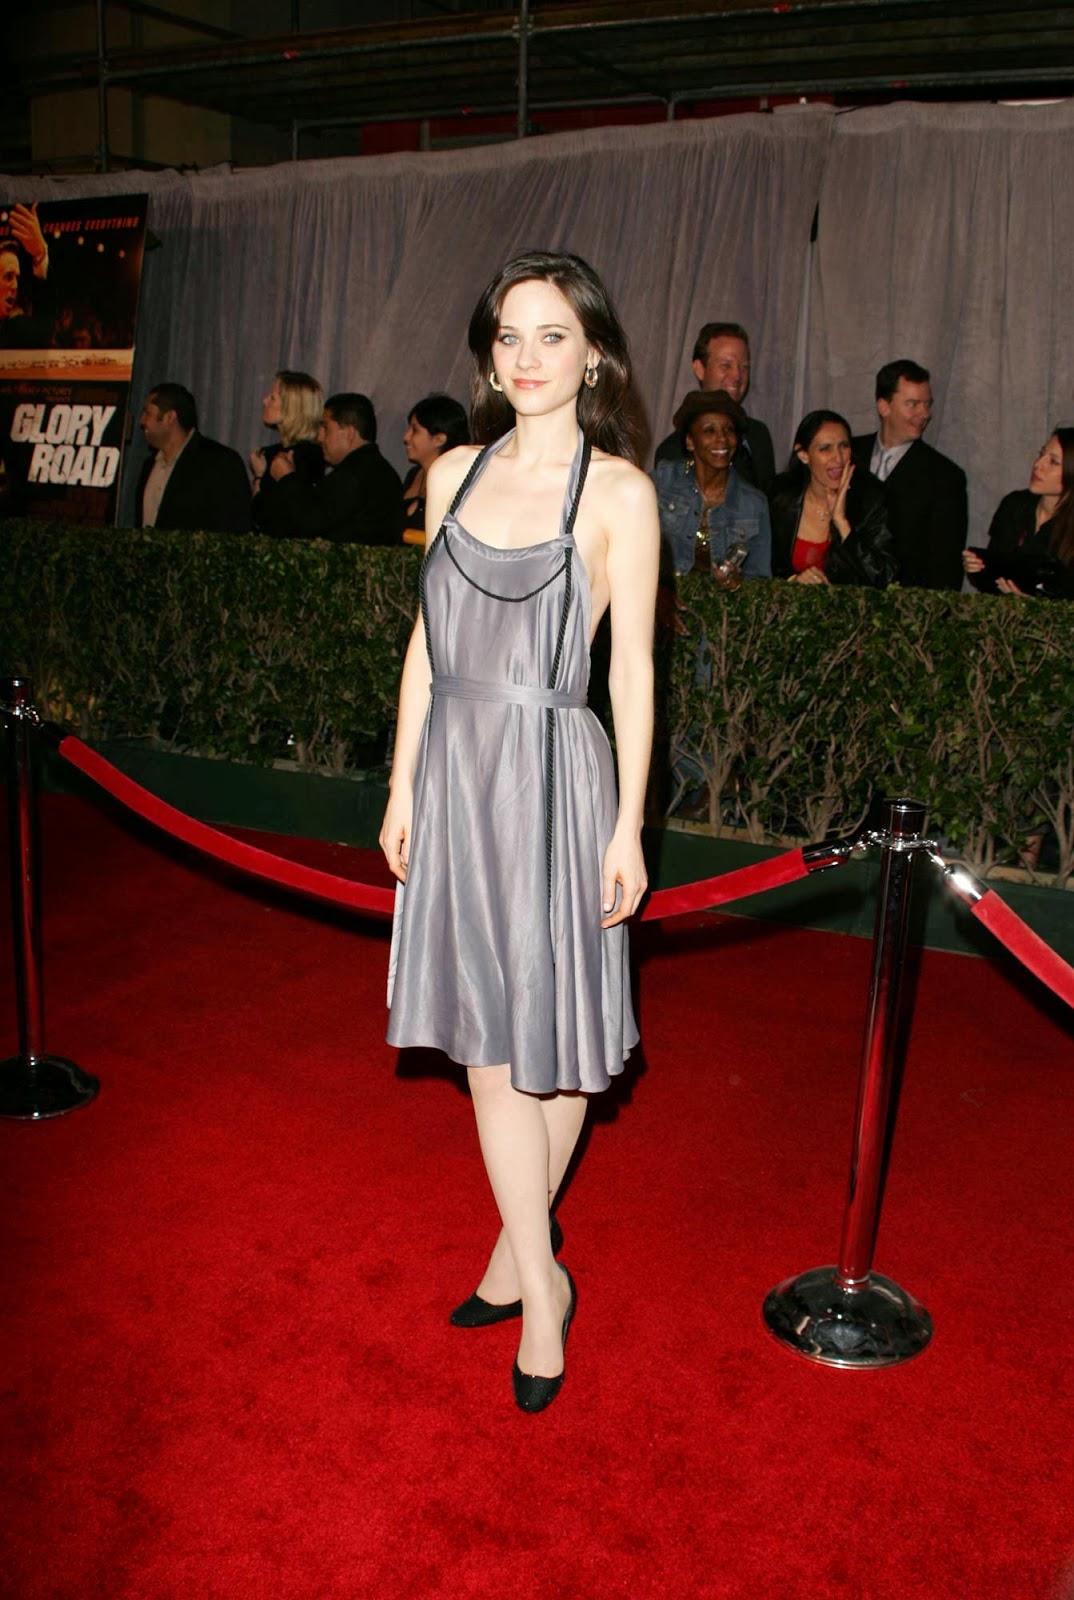 Red Carpet Dresses Zooey Deschanel Quot Glory Road Quot World